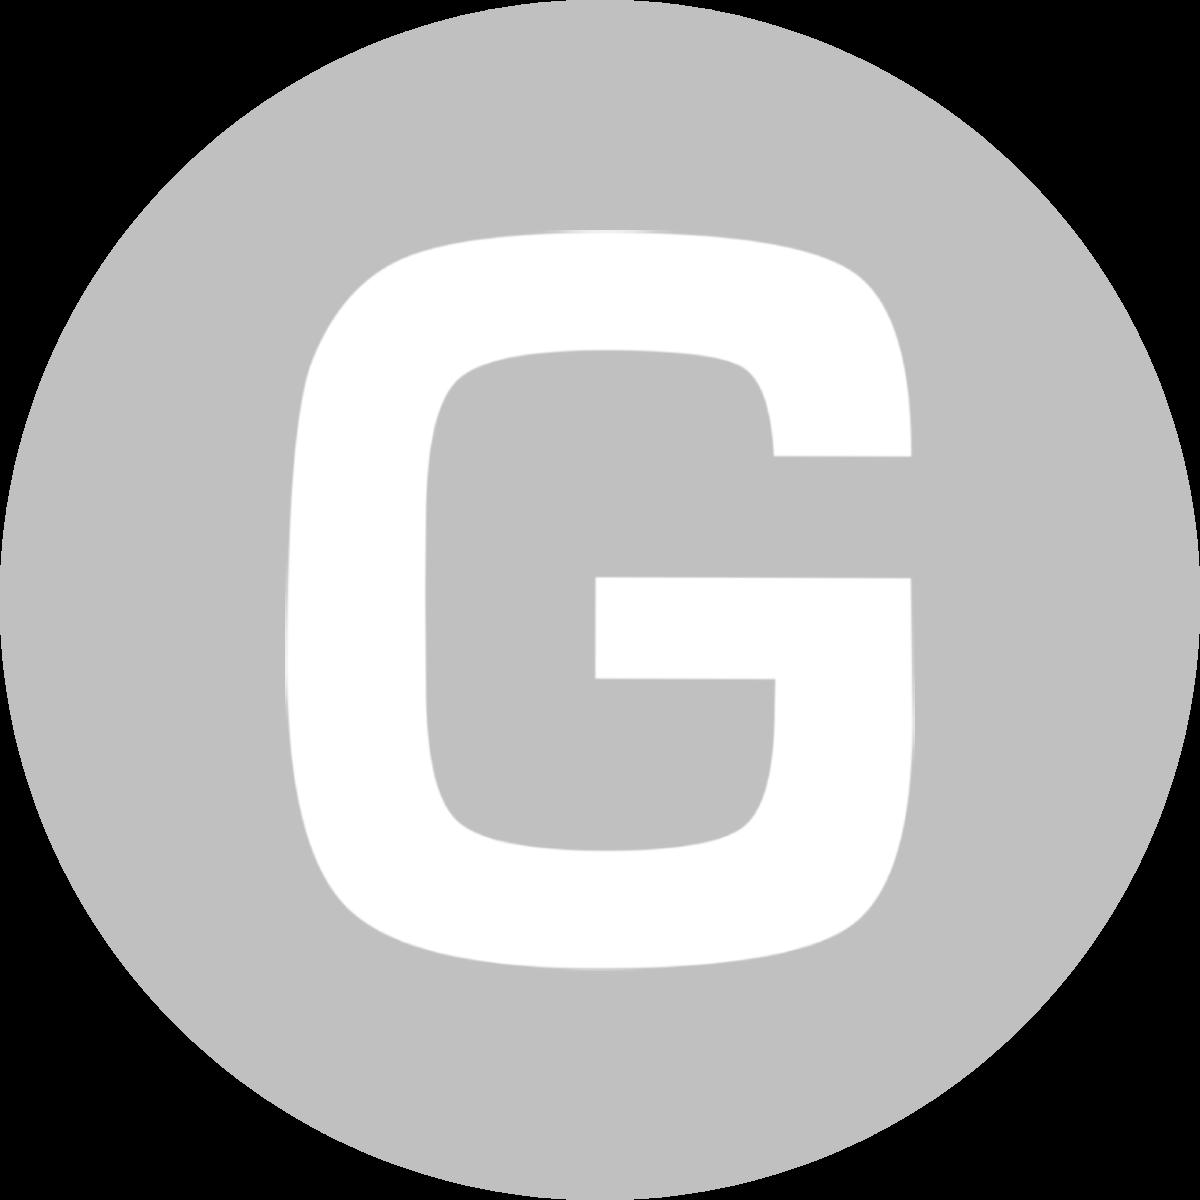 Nike Caps Aerobill Classic 99 Hvit/Sort